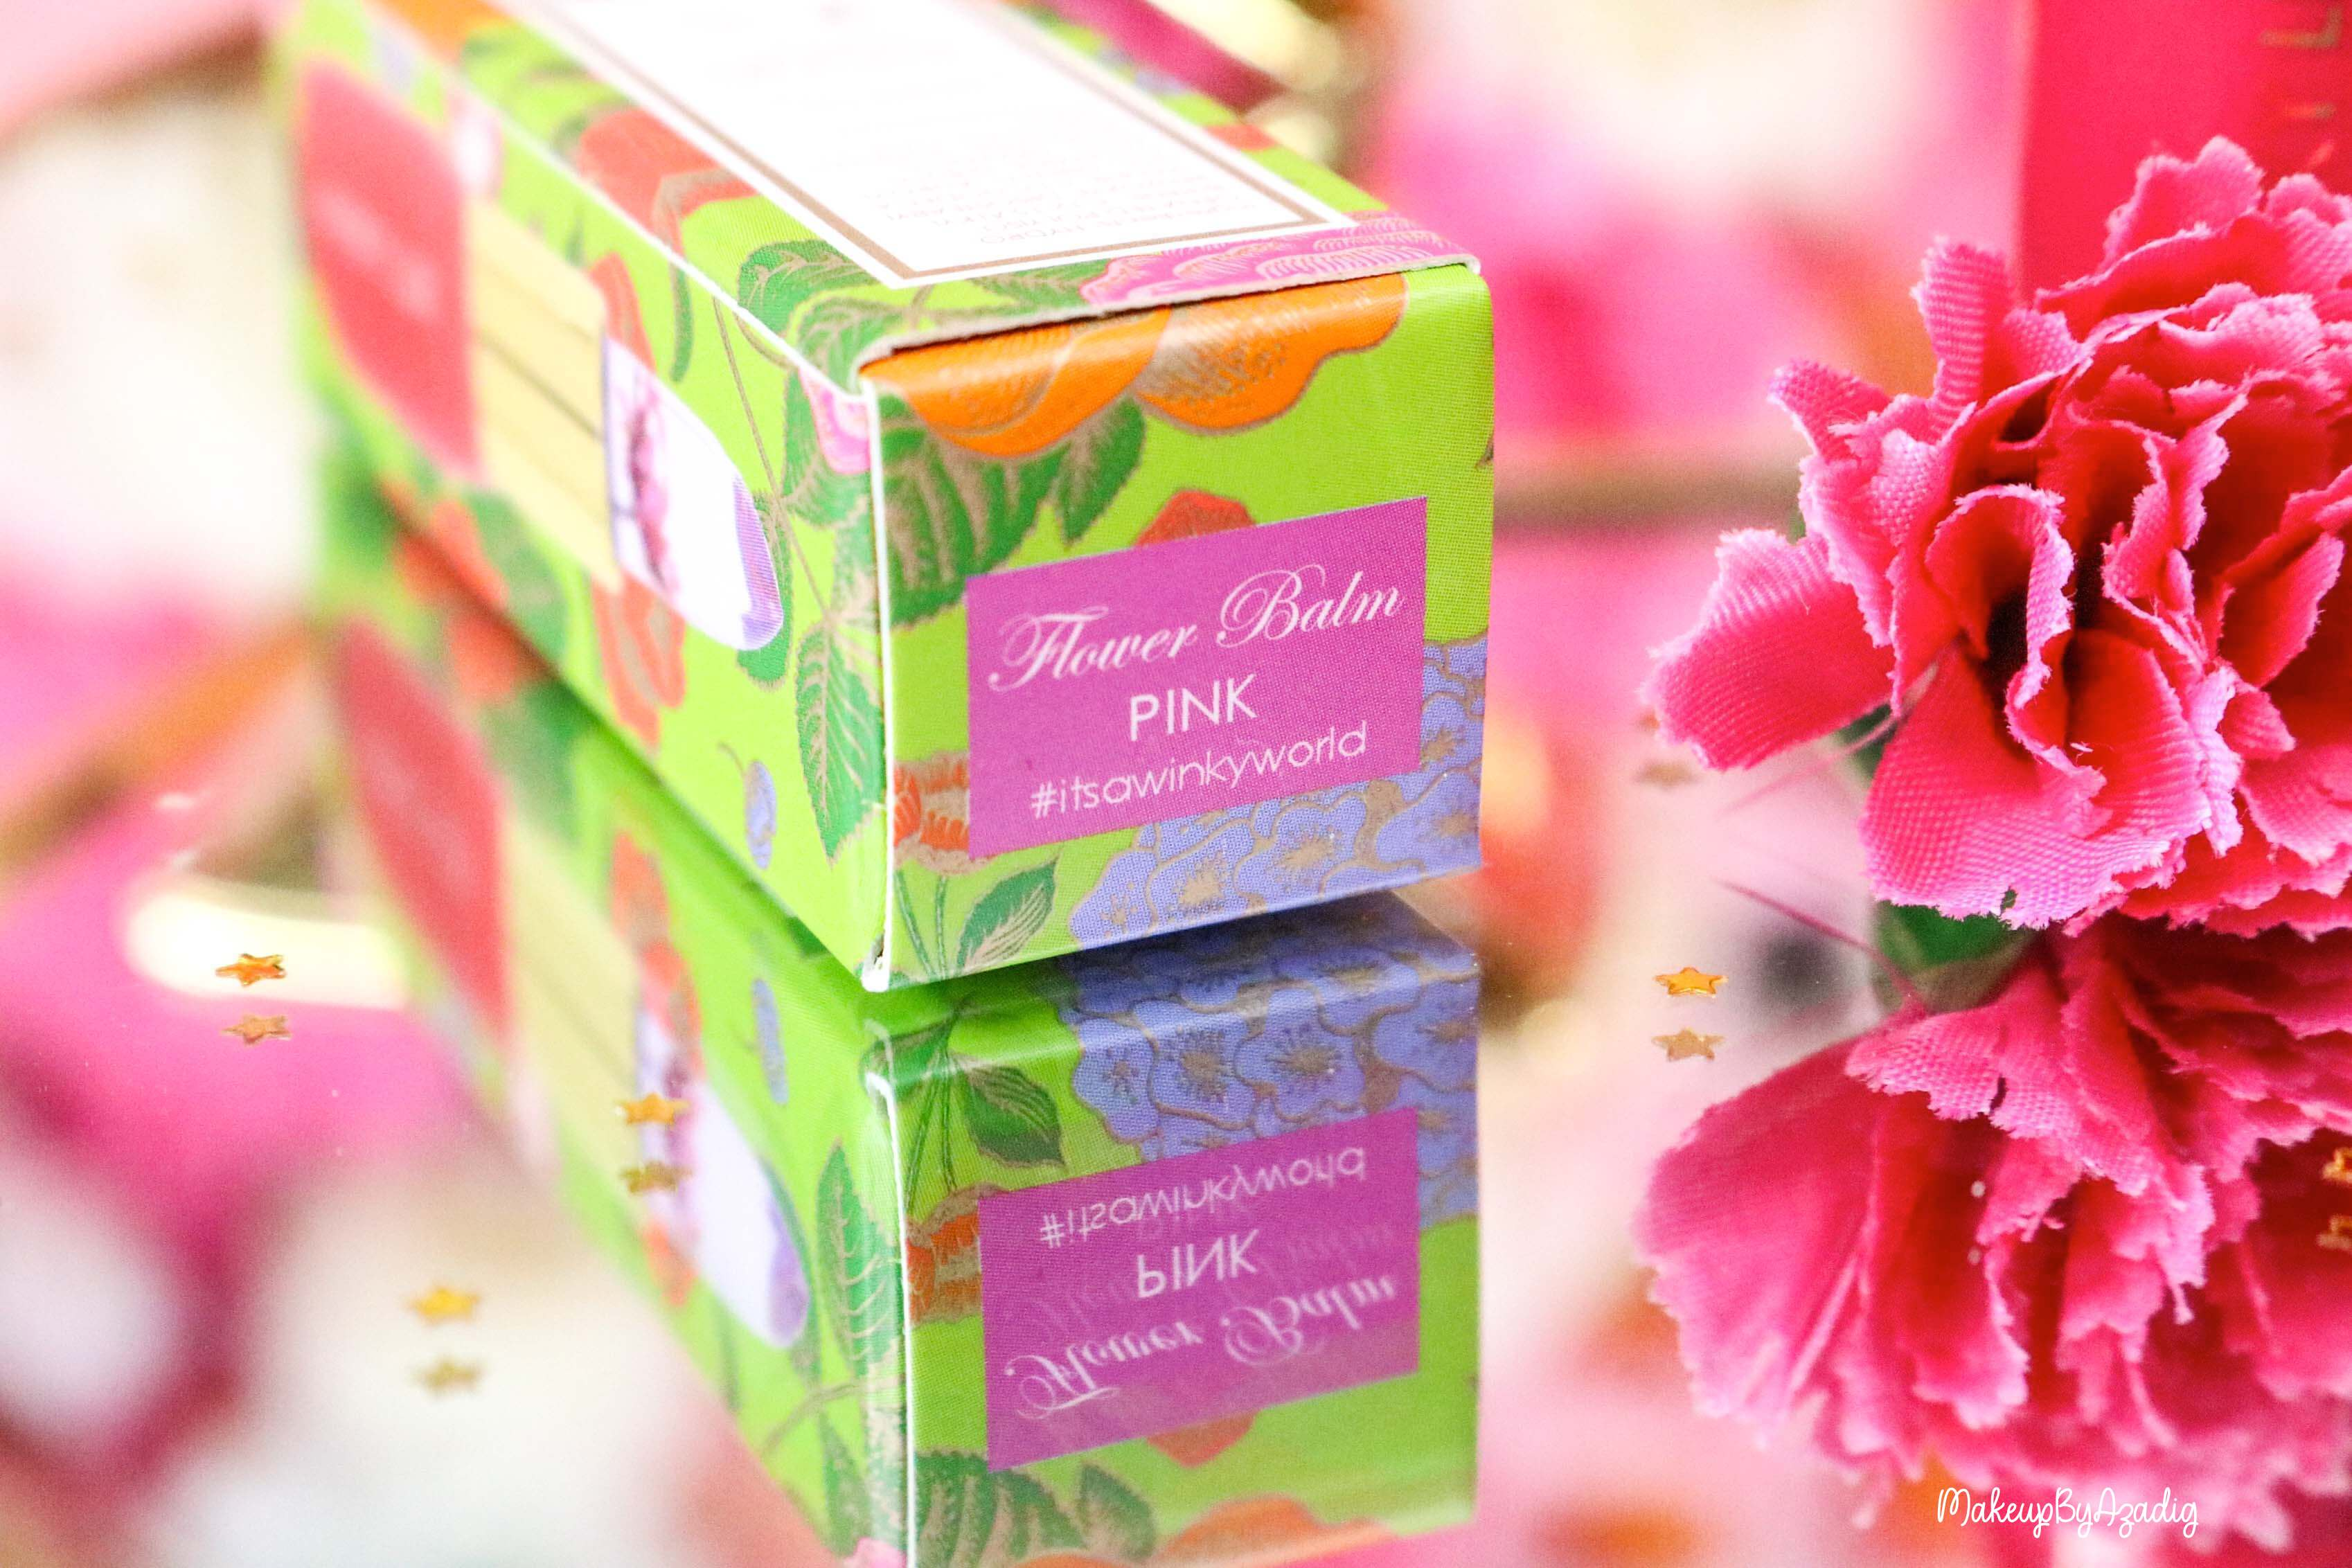 revue-flower-balm-baume-levres-winky-lux-sephora-rose-avis-prix-makeupbyazadig-itsawinkyworld